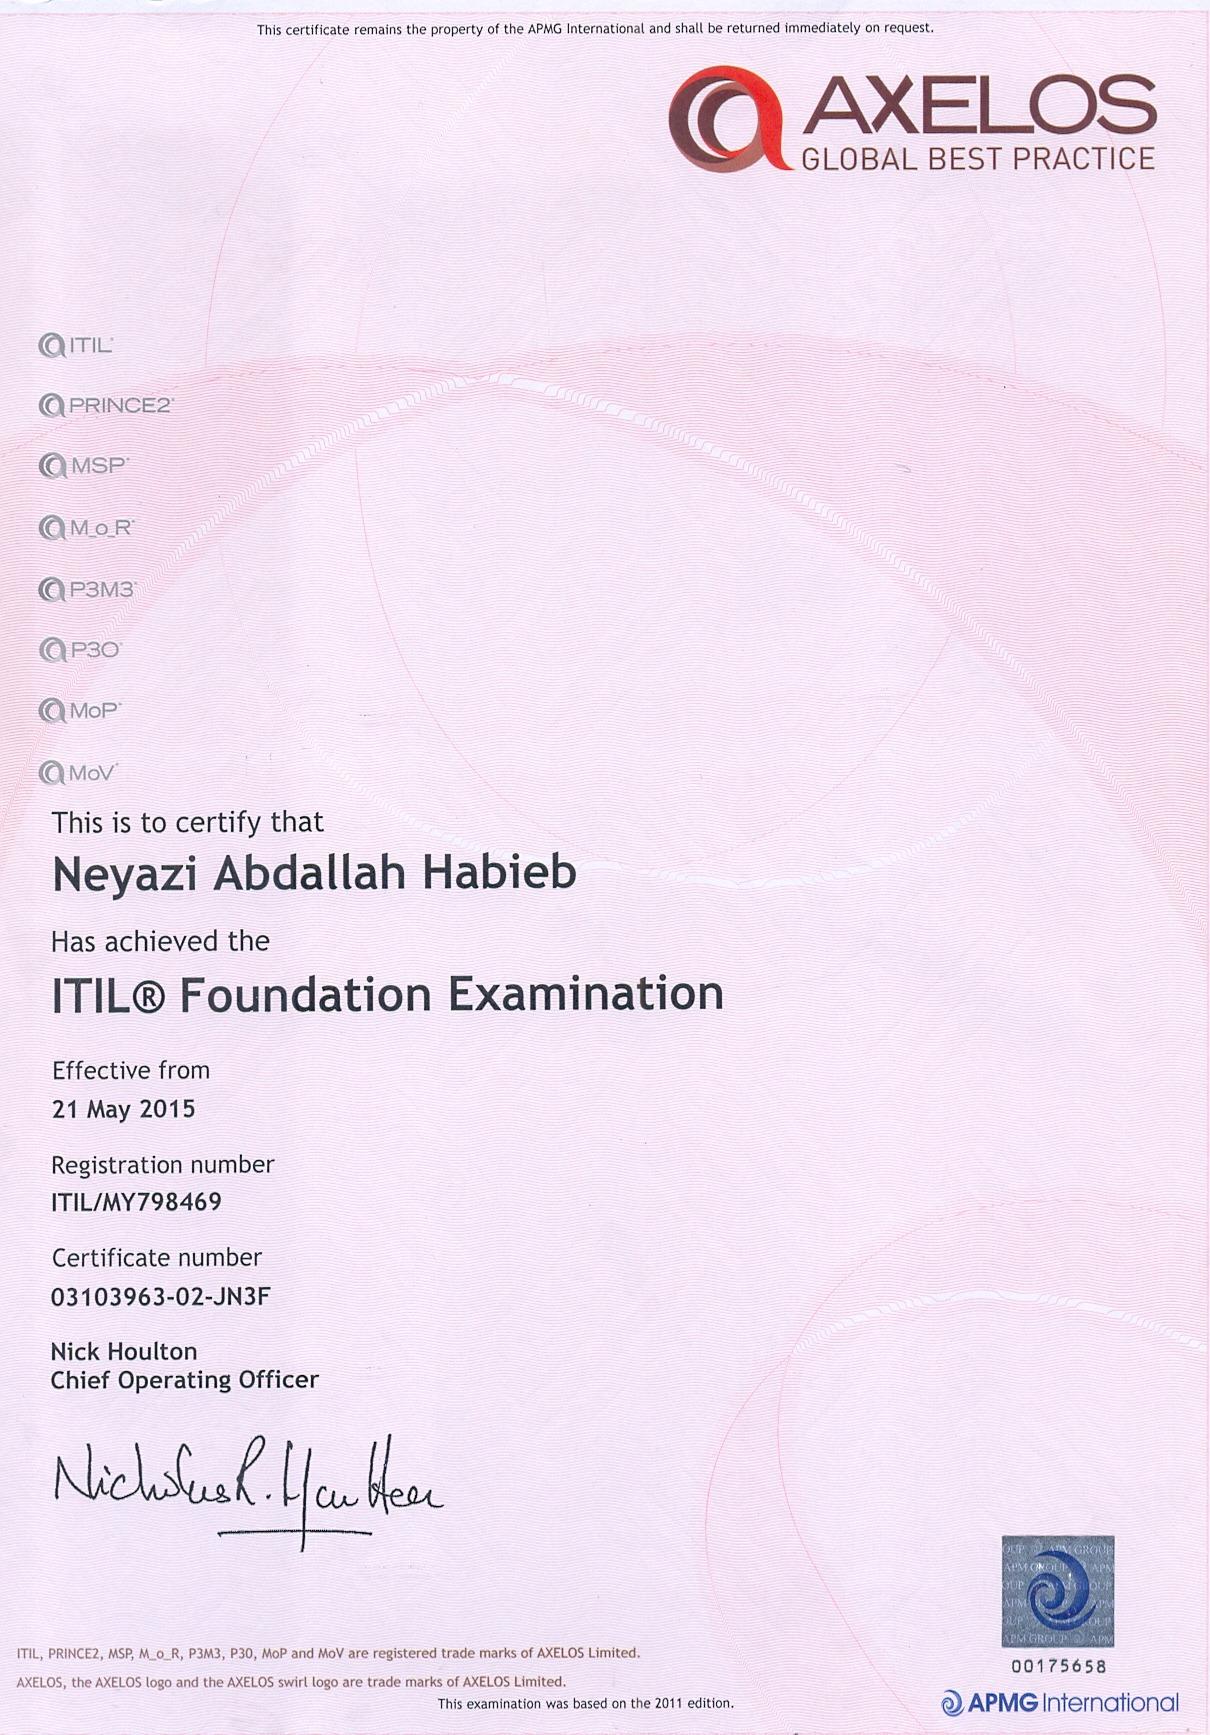 Neyazi abdallah habieb ahmed bayt itil foundation certificate xflitez Gallery